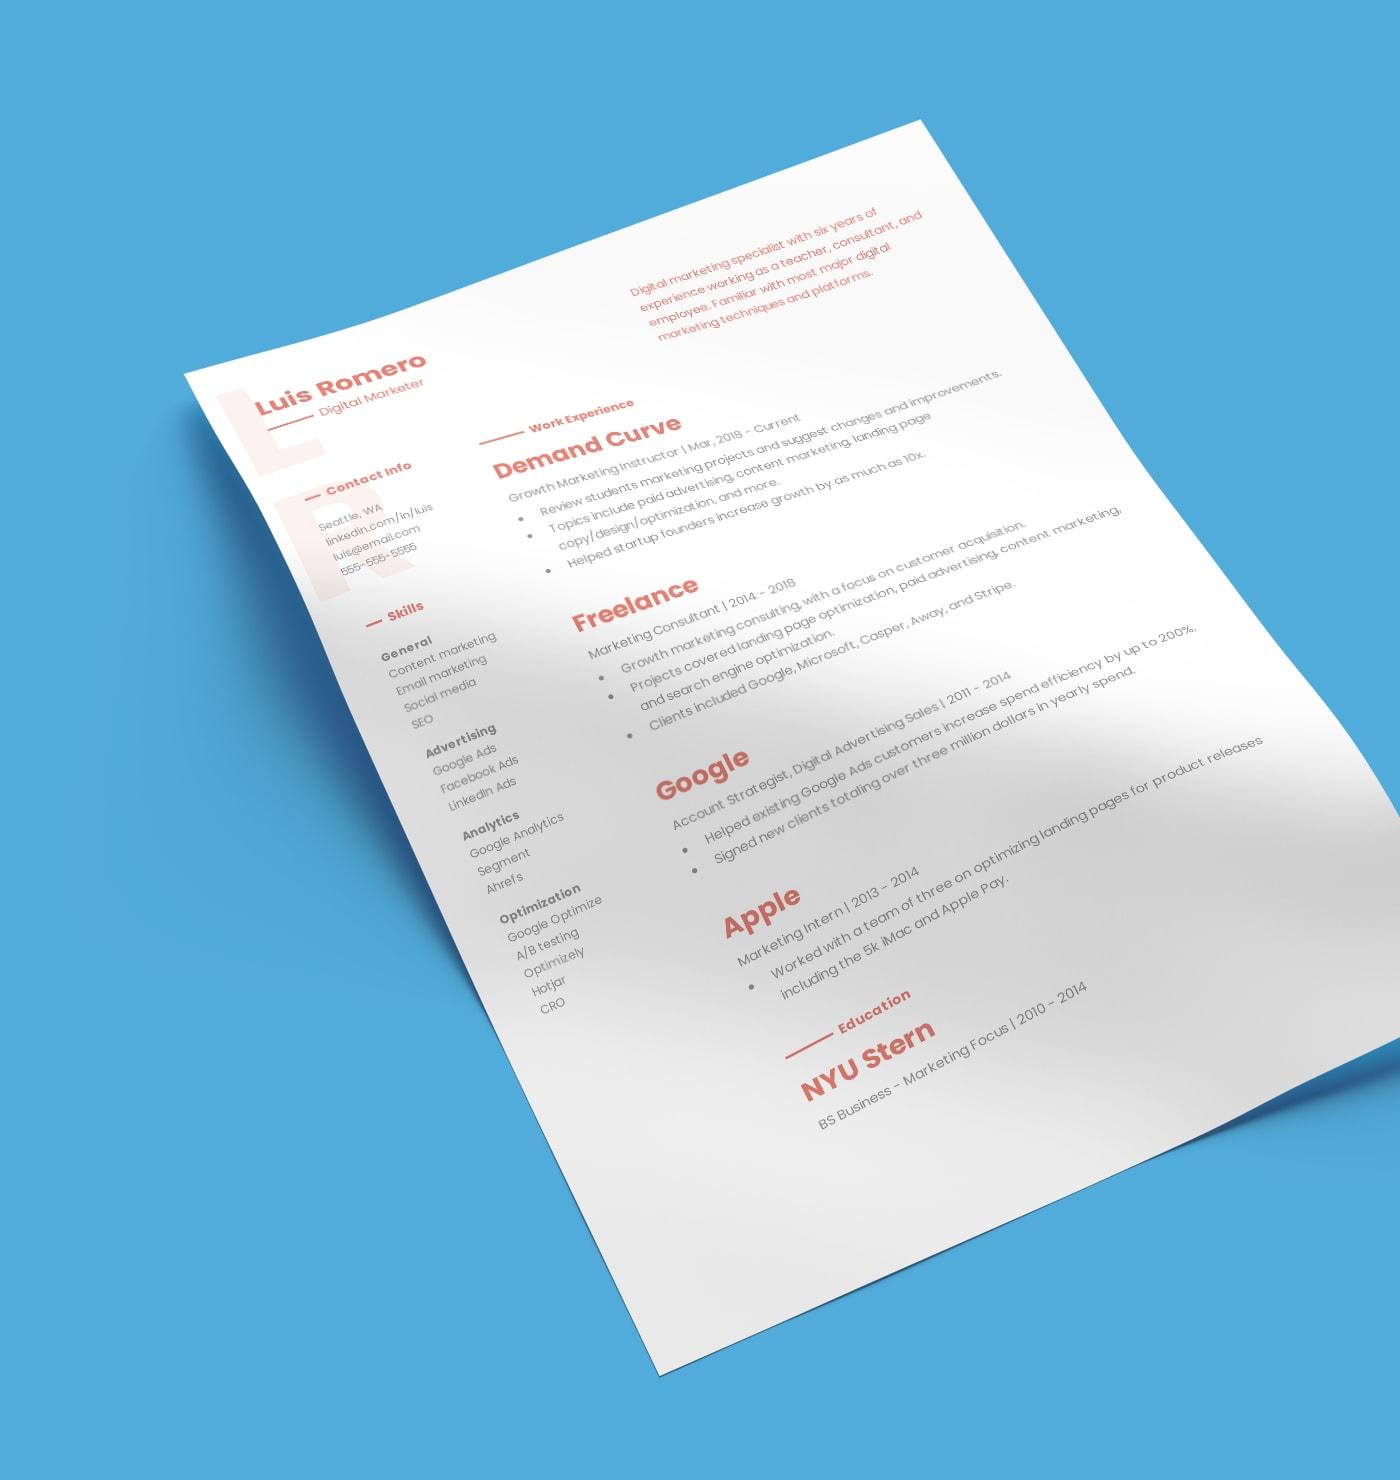 Georgia modern resume template created with Standard Resume builder.